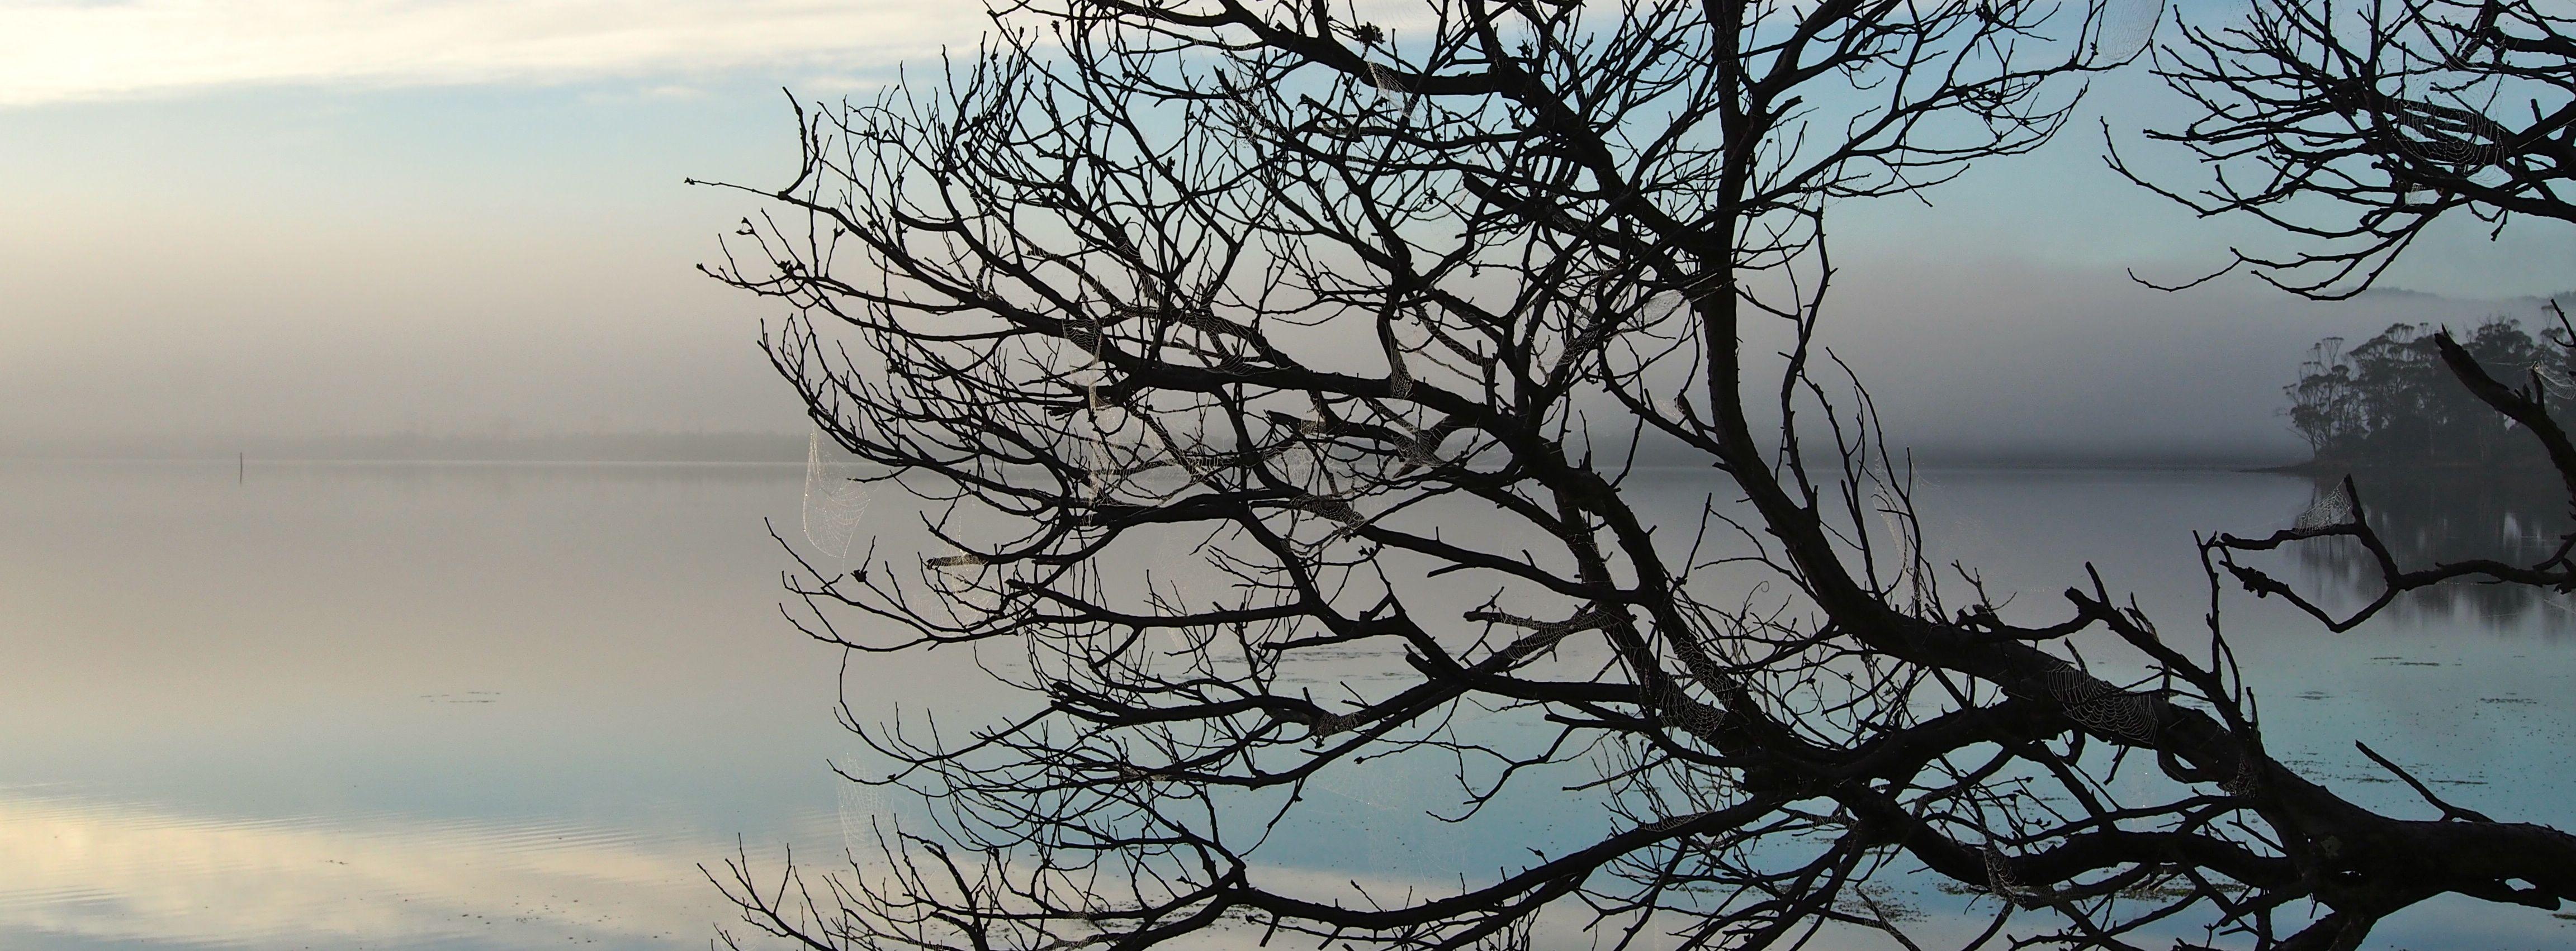 Tree, cobwebs, mist in the morning.